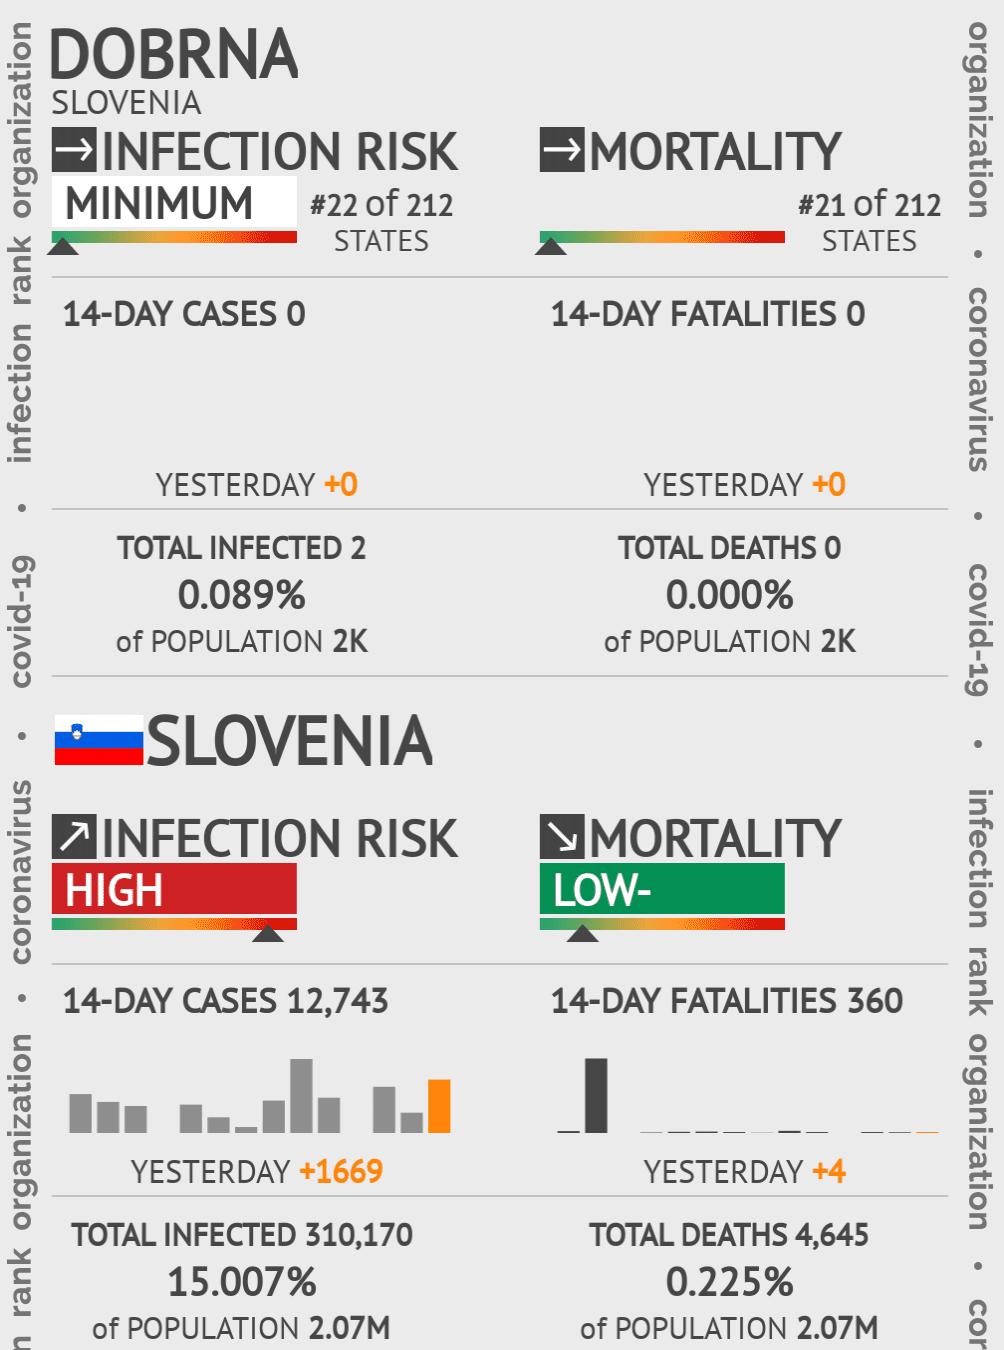 Dobrna Coronavirus Covid-19 Risk of Infection on May 14, 2020